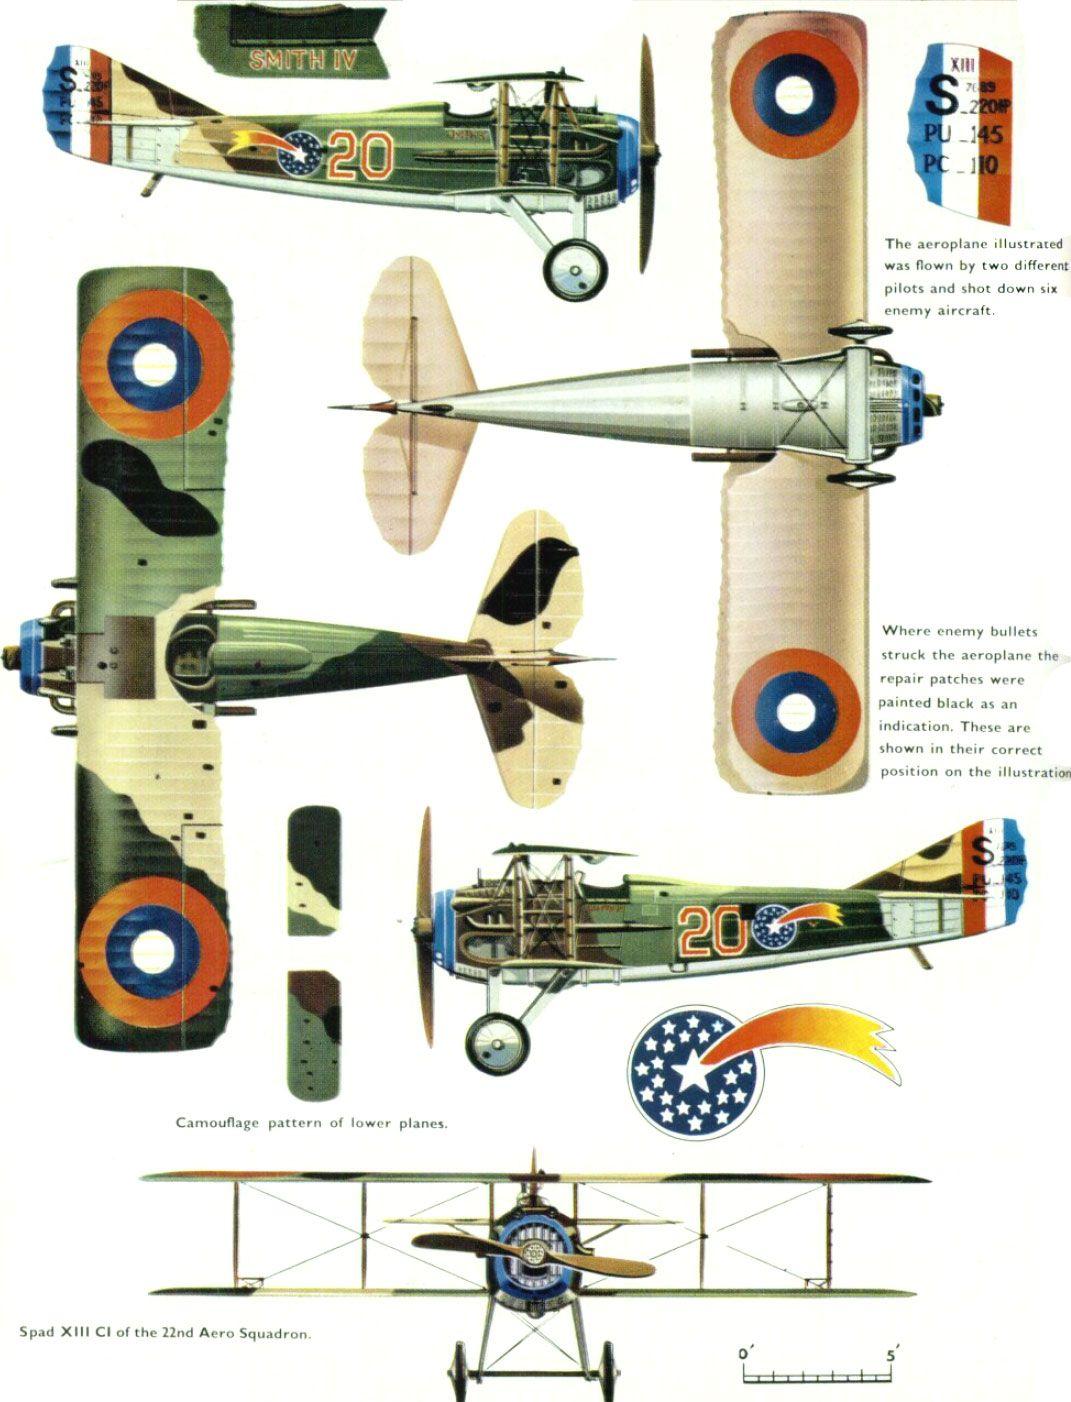 22nd Aero Squadron